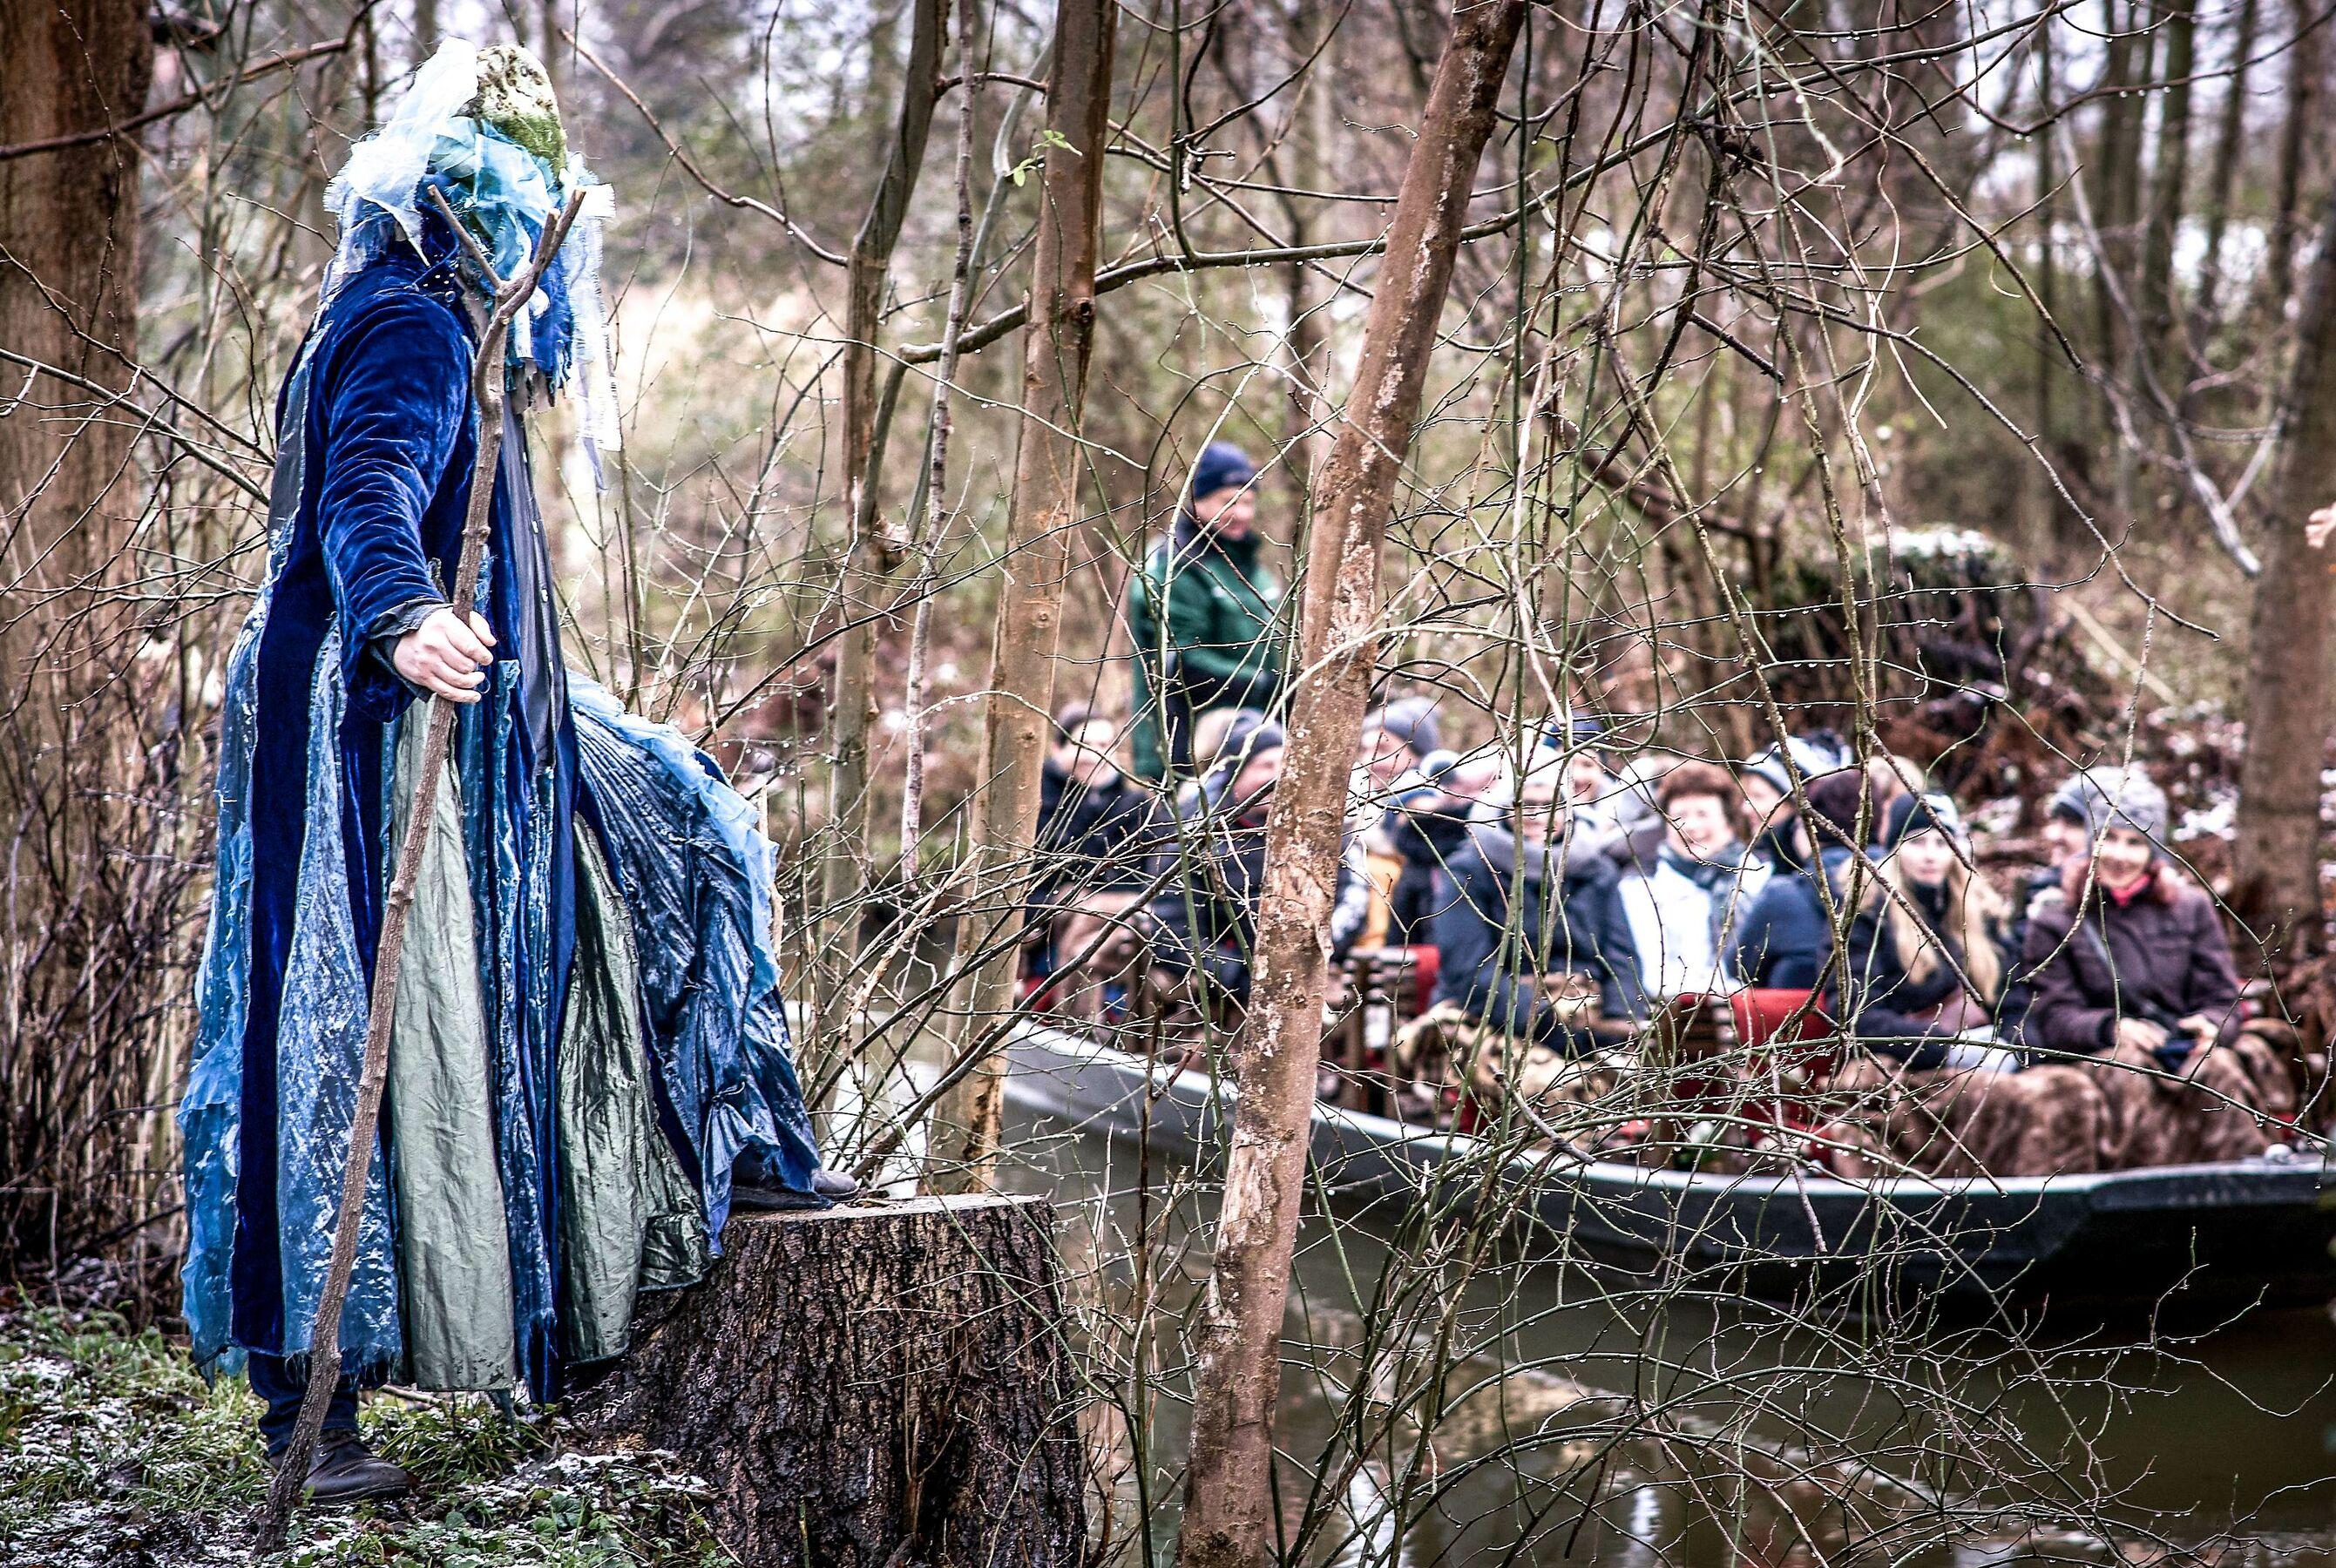 Advents-Theater-Kahnfahrt, Foto: Kahnfährmannsverein der Spreewadldfreunde e.V.